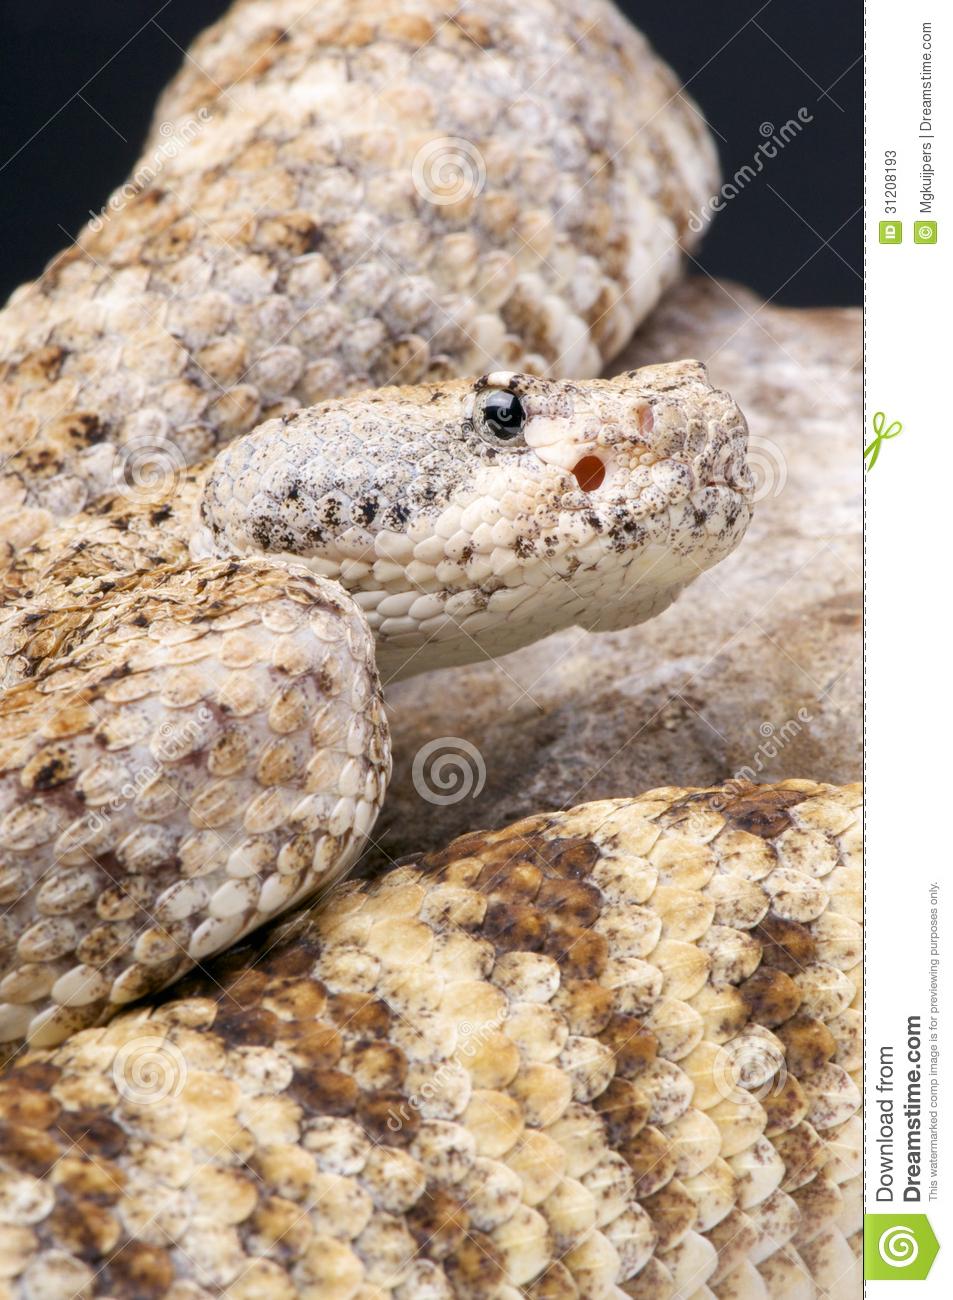 Rock Rattlesnake / Crotalus Mitchellii Pyrrhus Stock Photos.